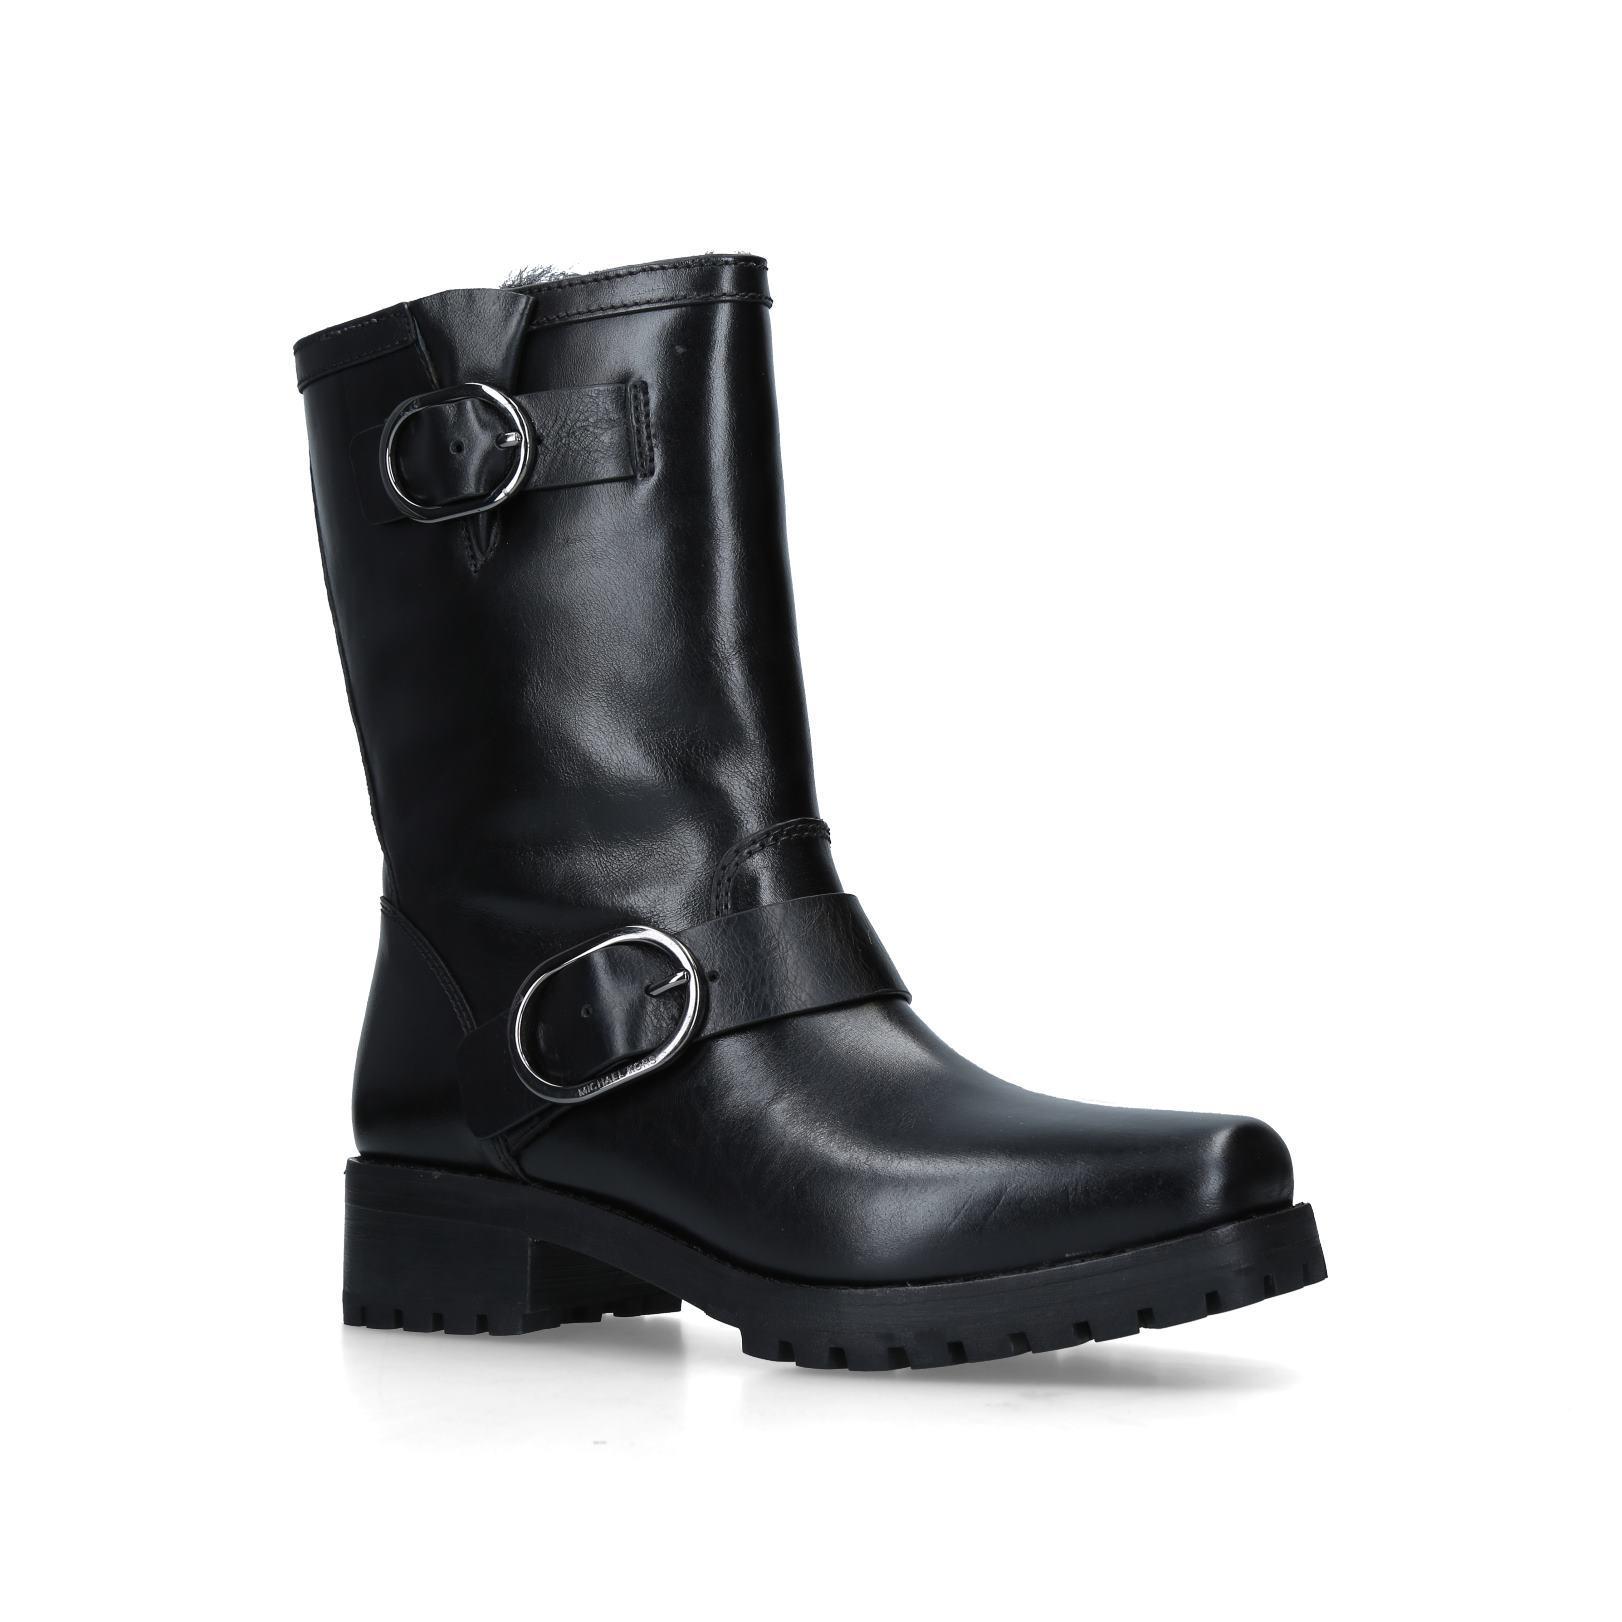 c6dce5ccf39 ROSARIO BOOTIE Rosario Bootie No Heel Ankle Boots Michael Michael ...